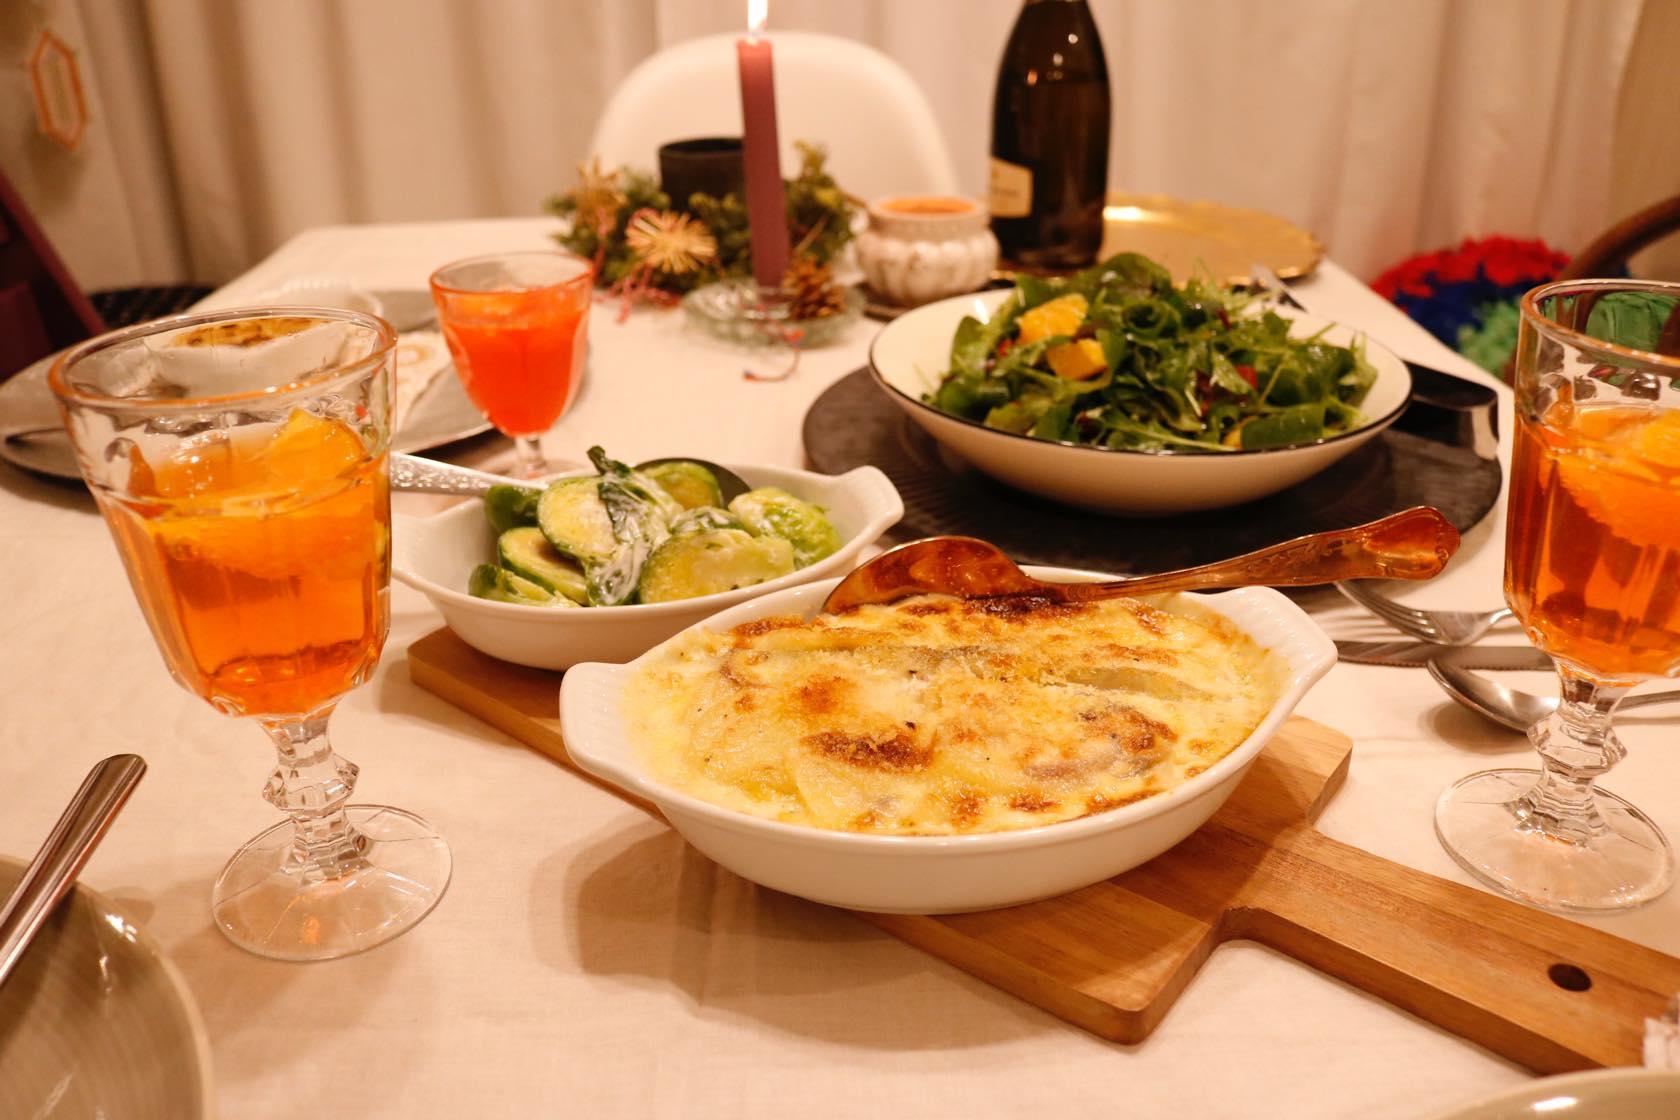 ONDtable パーティー料理 | ONDweb